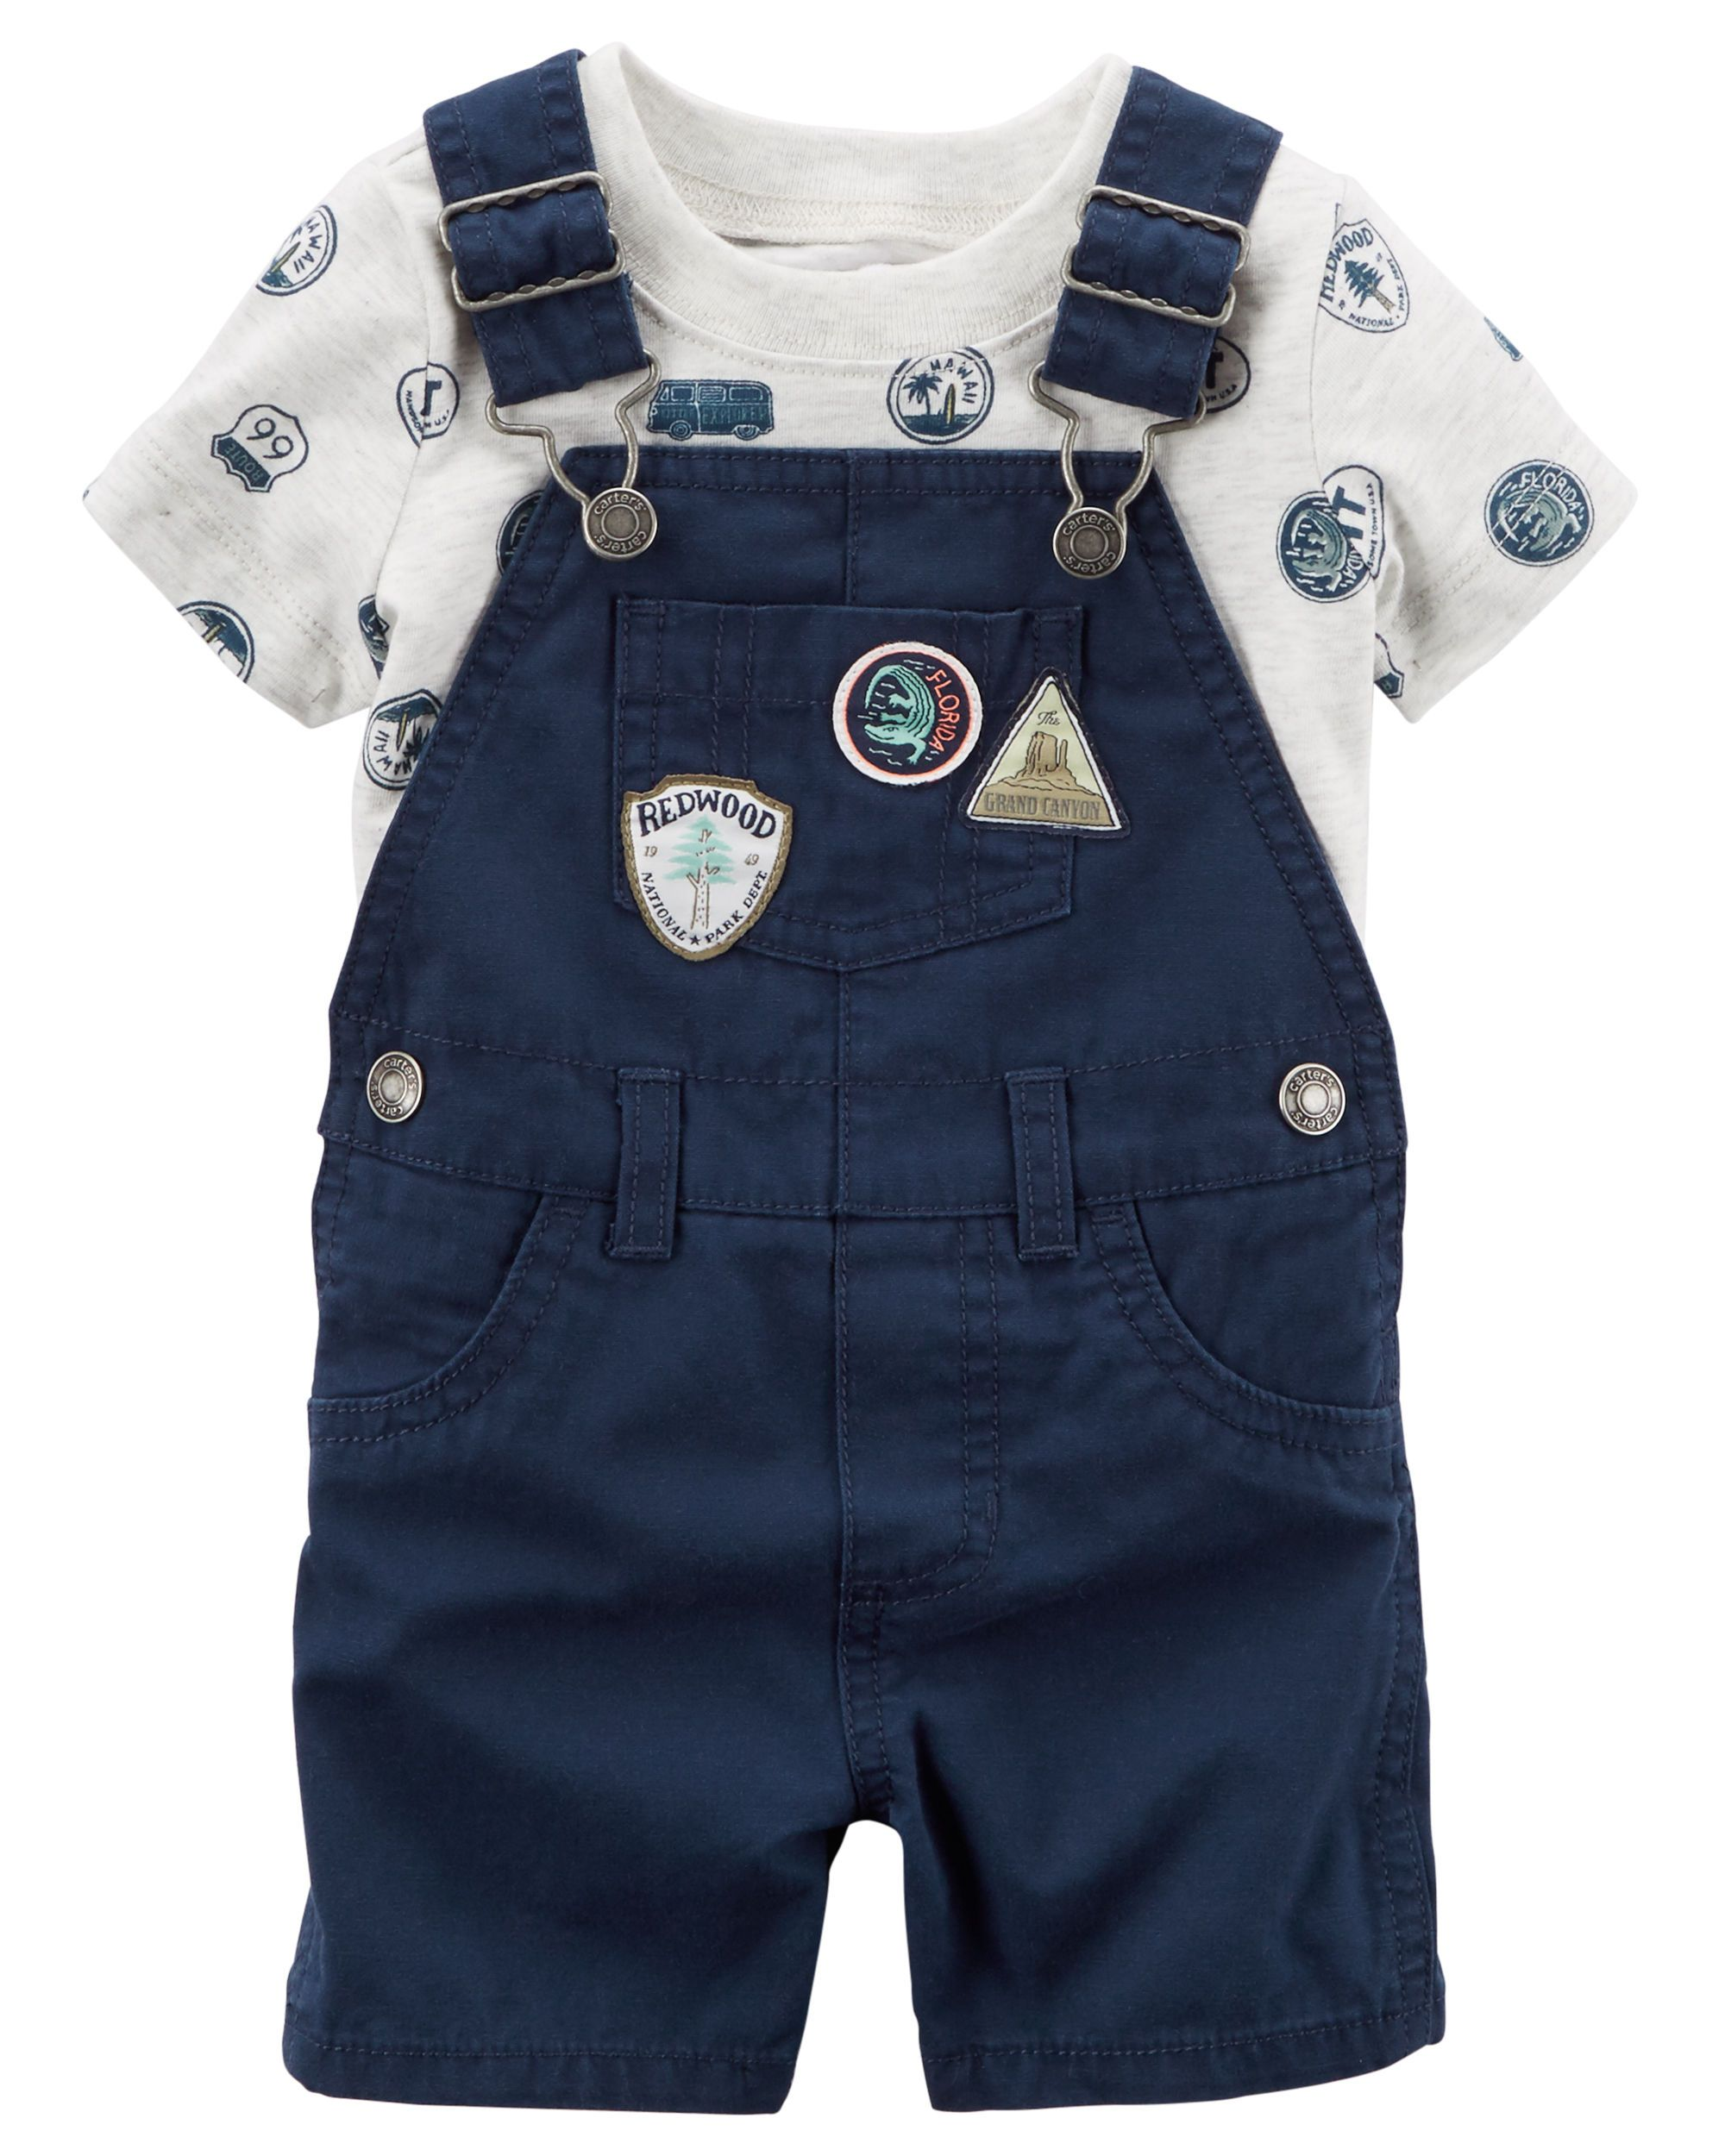 Baby Boy 2-Piece Top & Shortalls Set | Carters.com